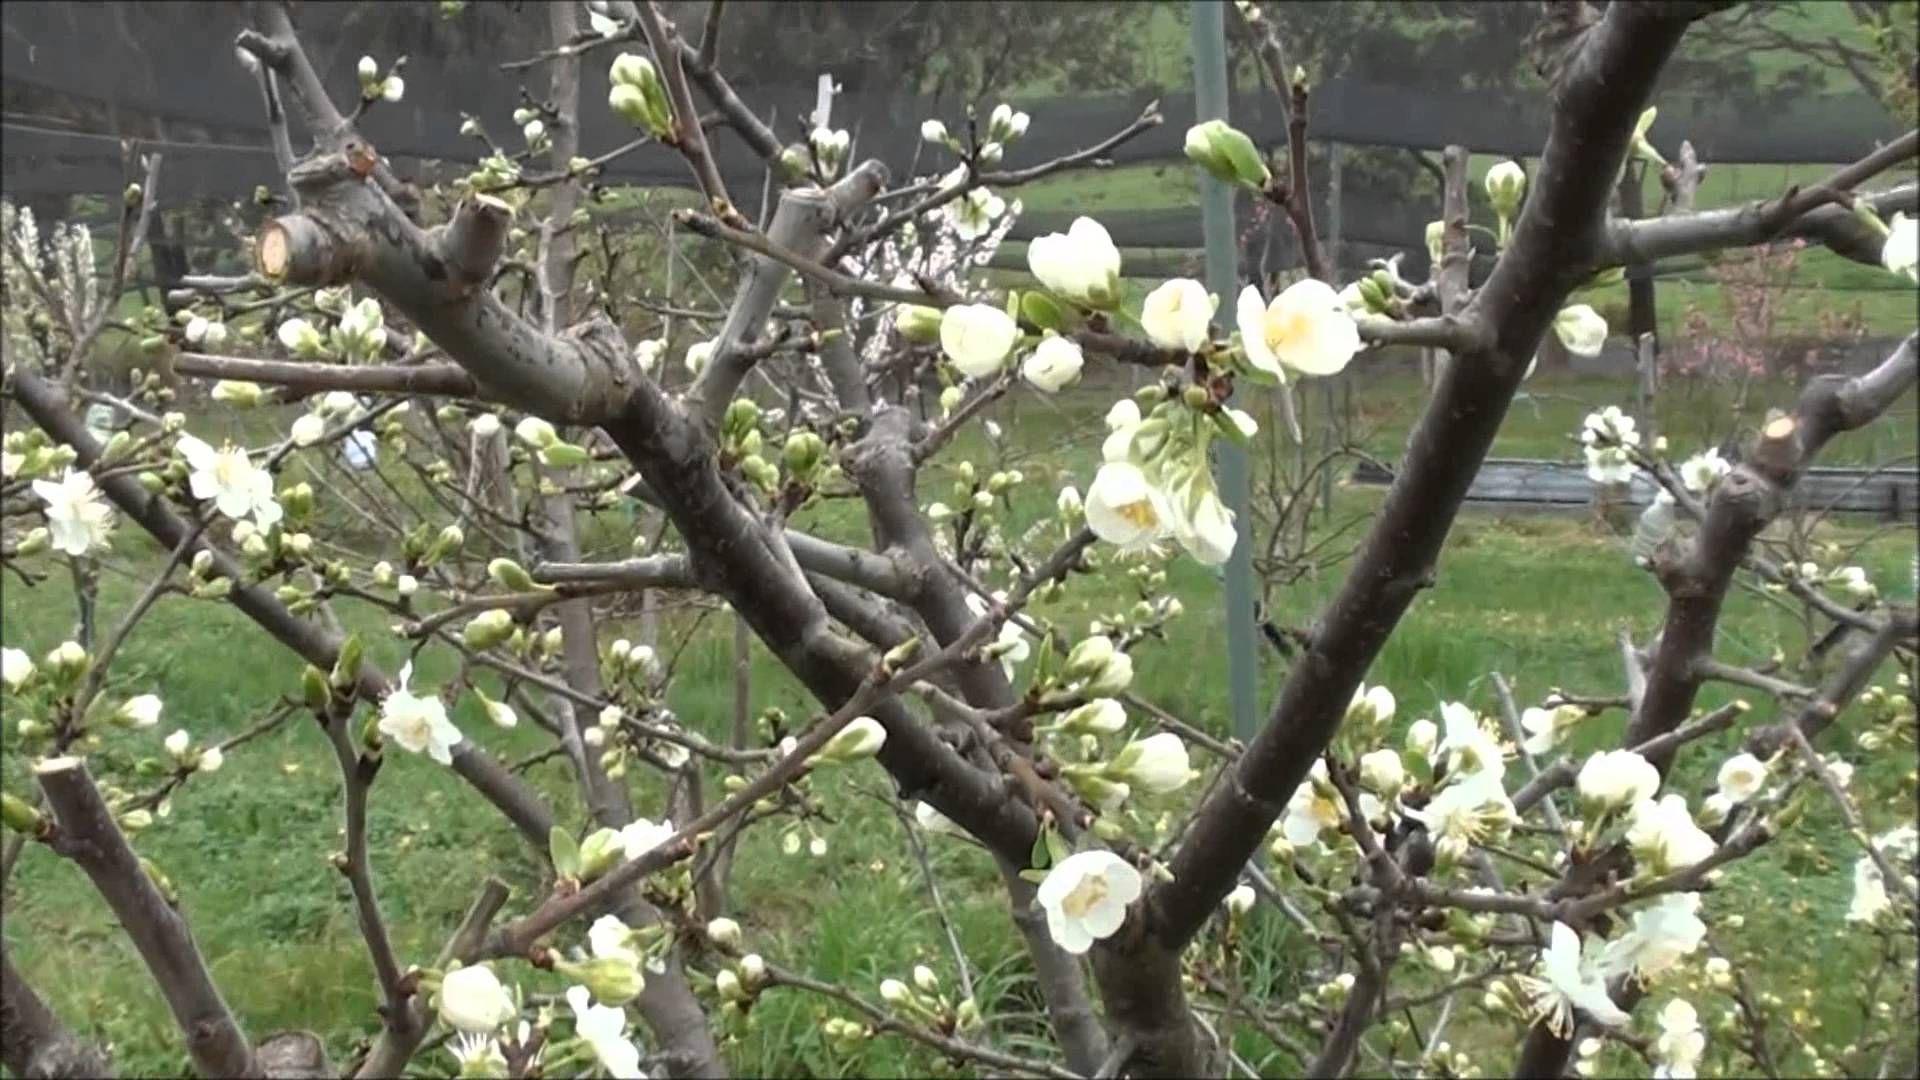 How To Prune Plum Trees Plum Tree Pruning Plum Trees Pruning Fruit Trees